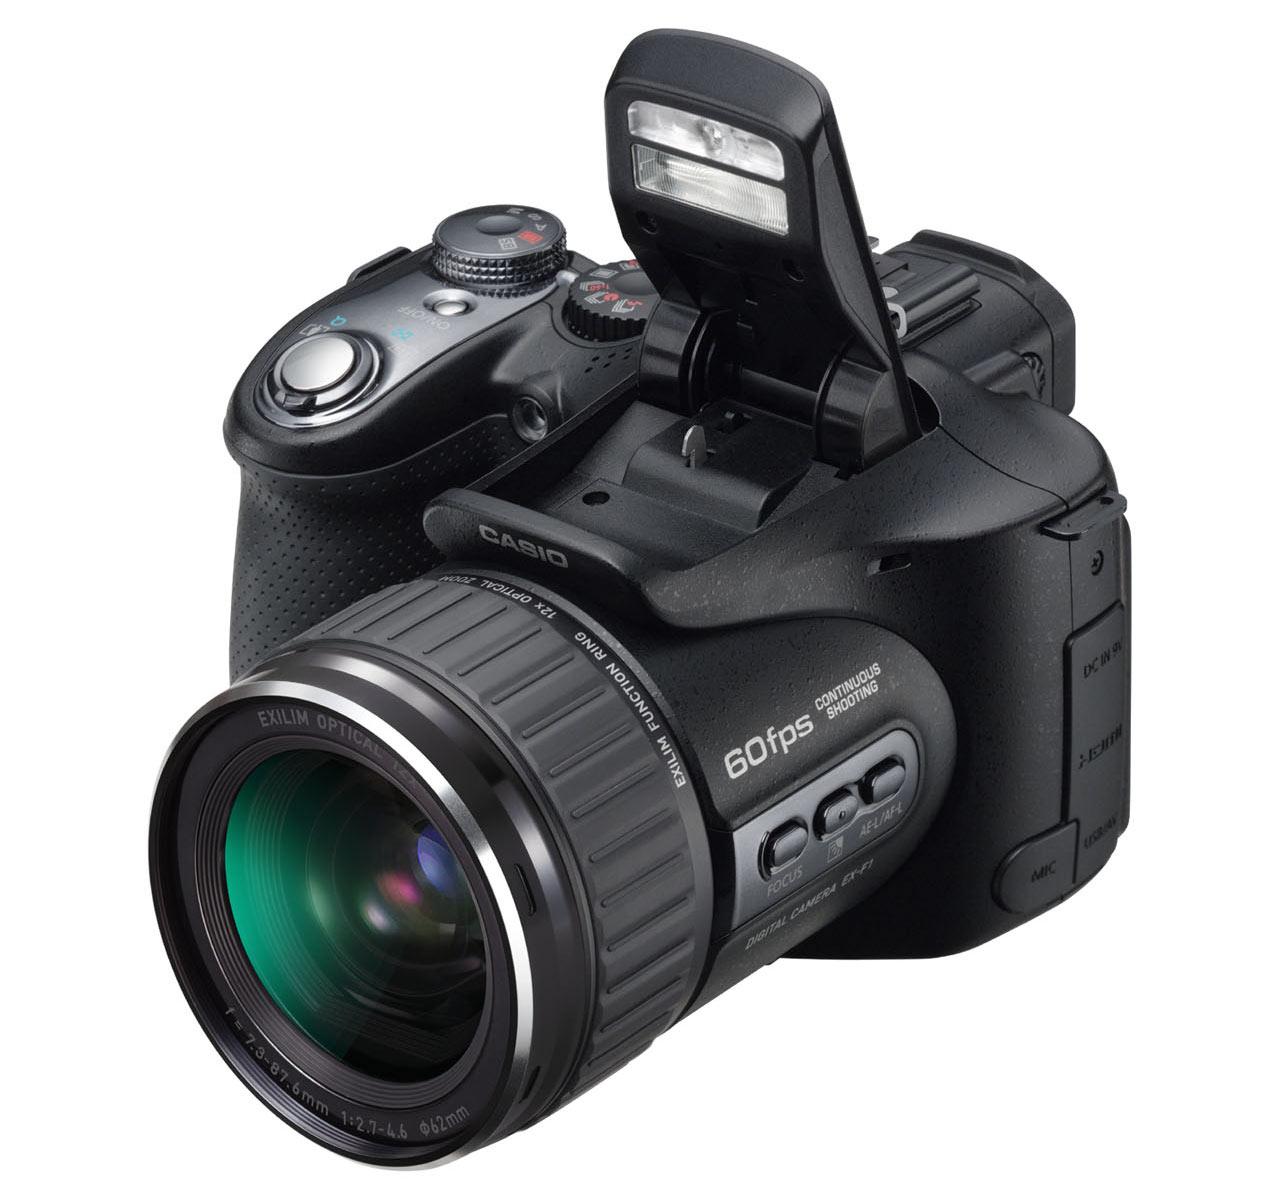 casio exilim pro ex f1 60fps digital photography review rh dpreview com Casio Exilim User Manual Verizon Casio Exilim Manual